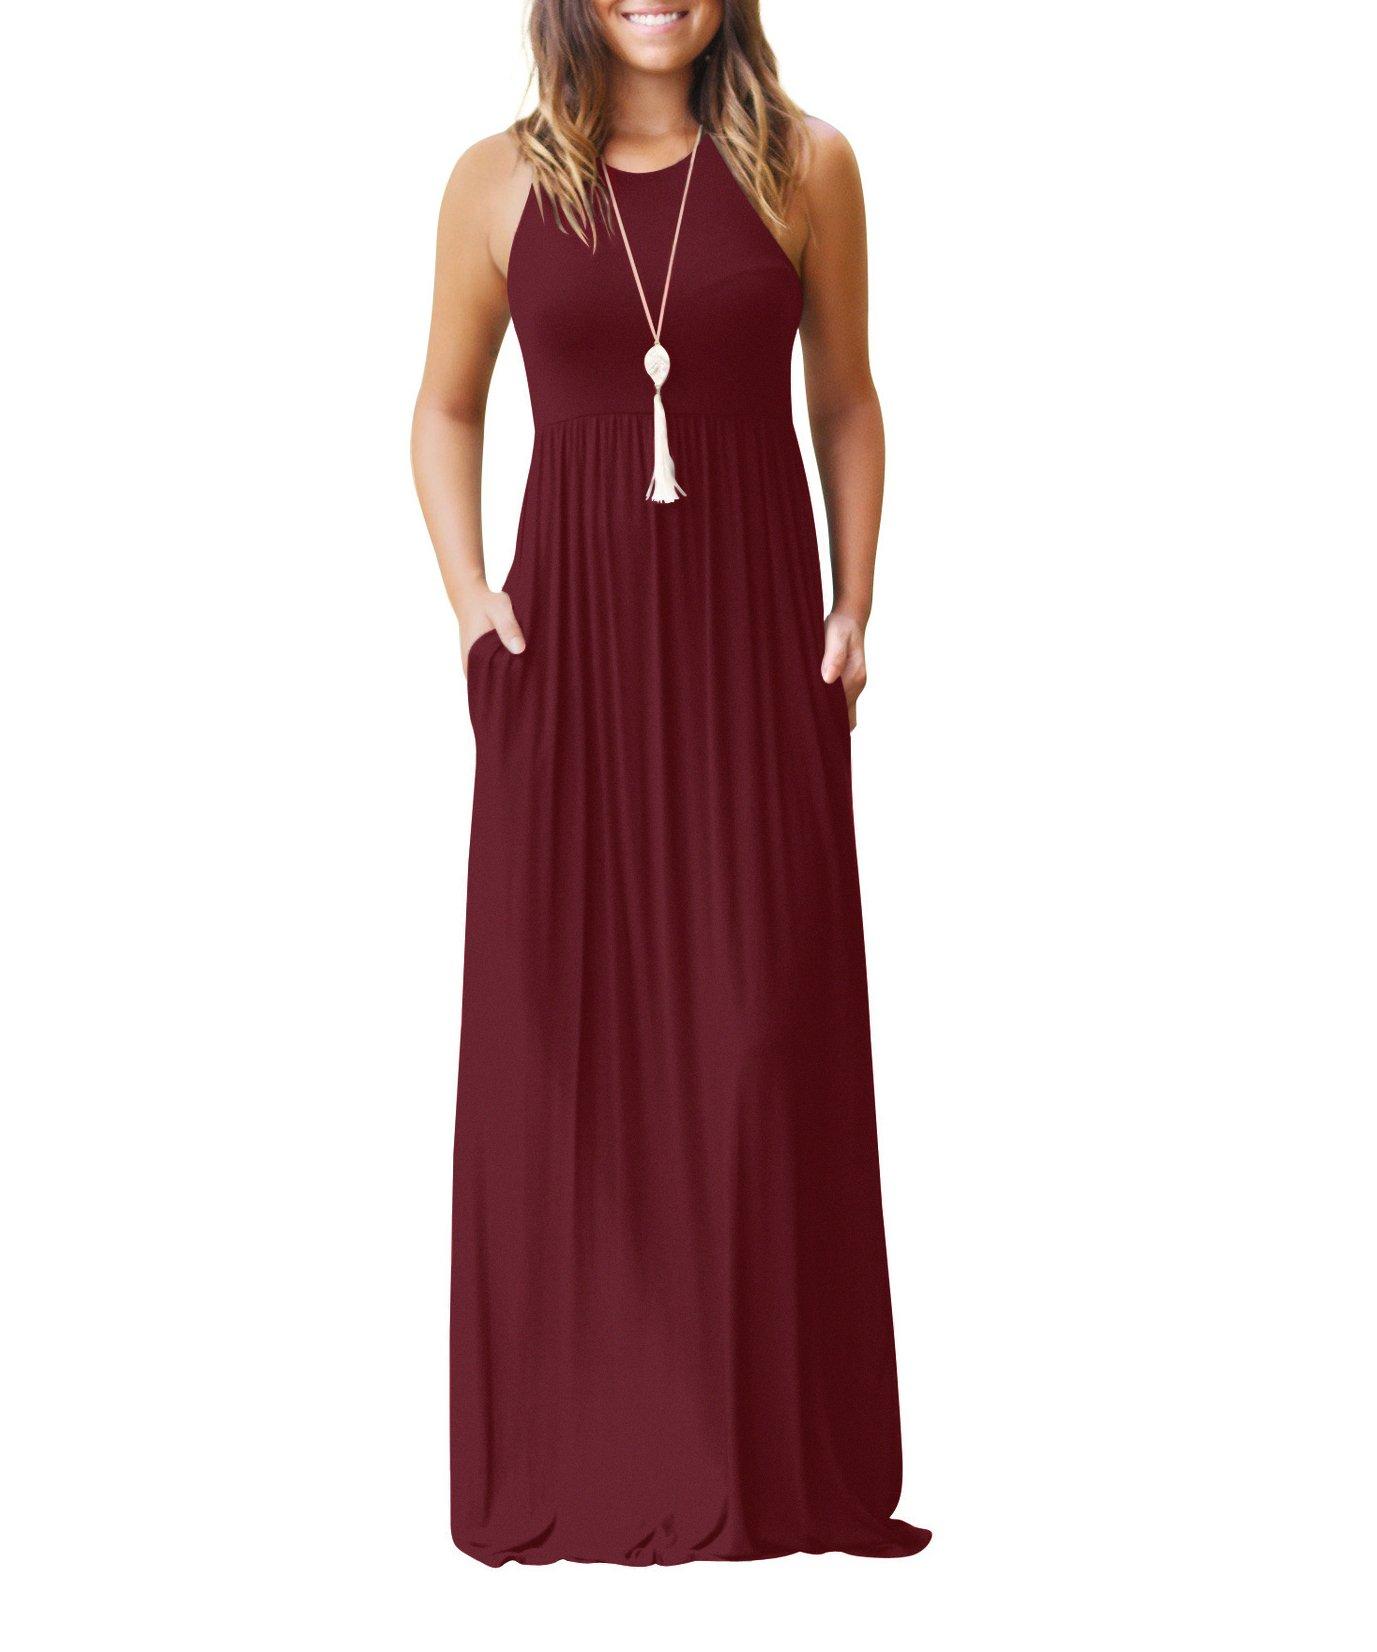 AAMILIFE Women's Sleeveless Racerback Casual Loose Plain Long Maxi Dresses with Pockets Burgundy M